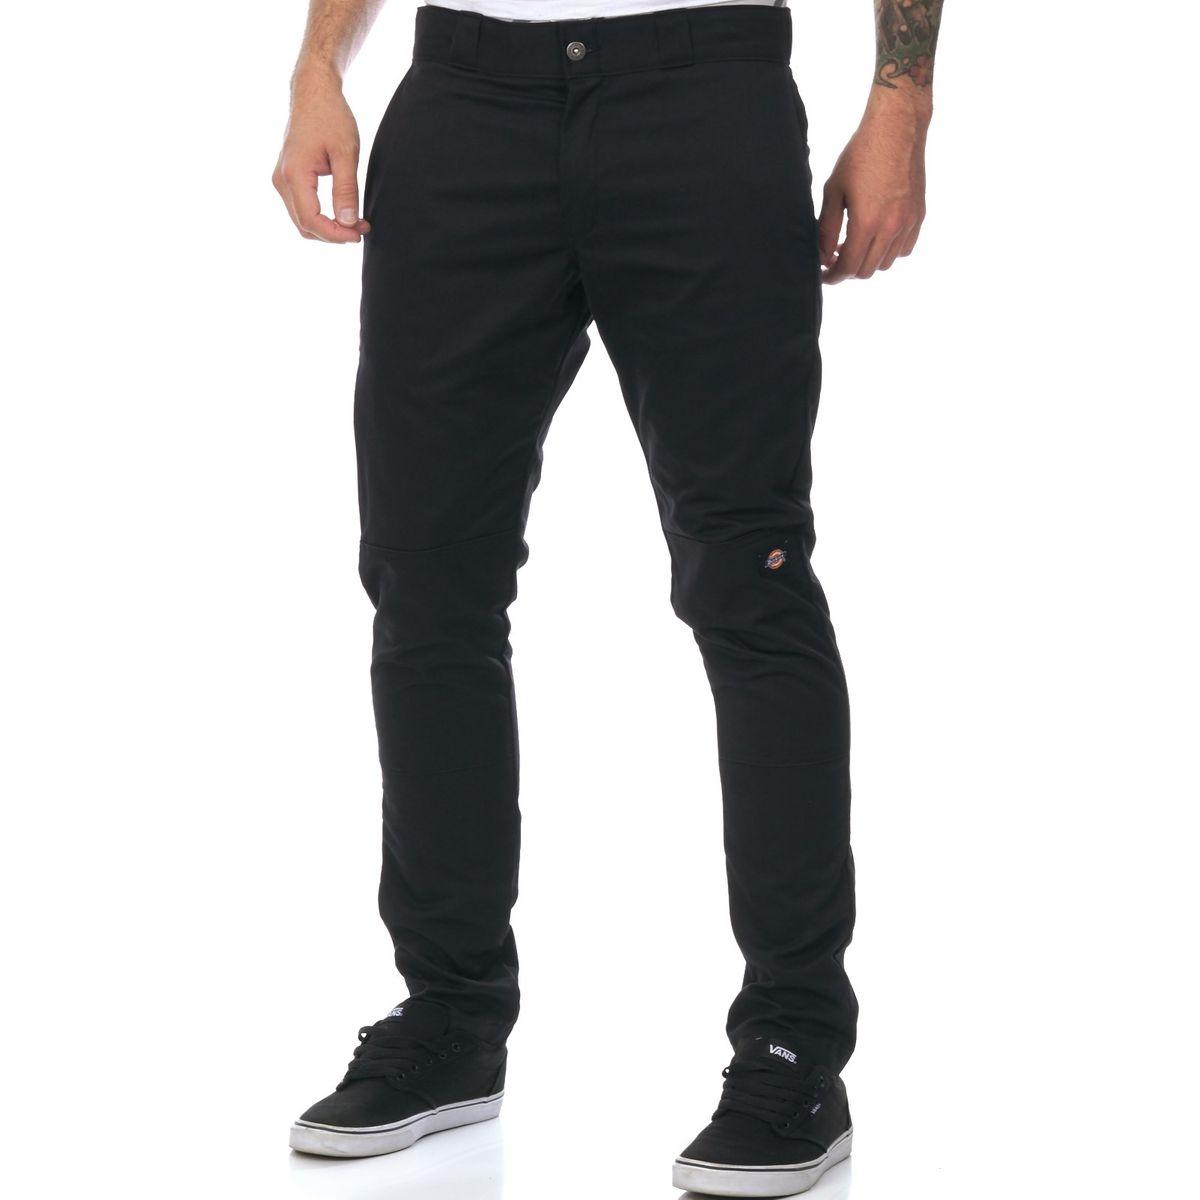 Pantalon Double Knee - Skinny Fit